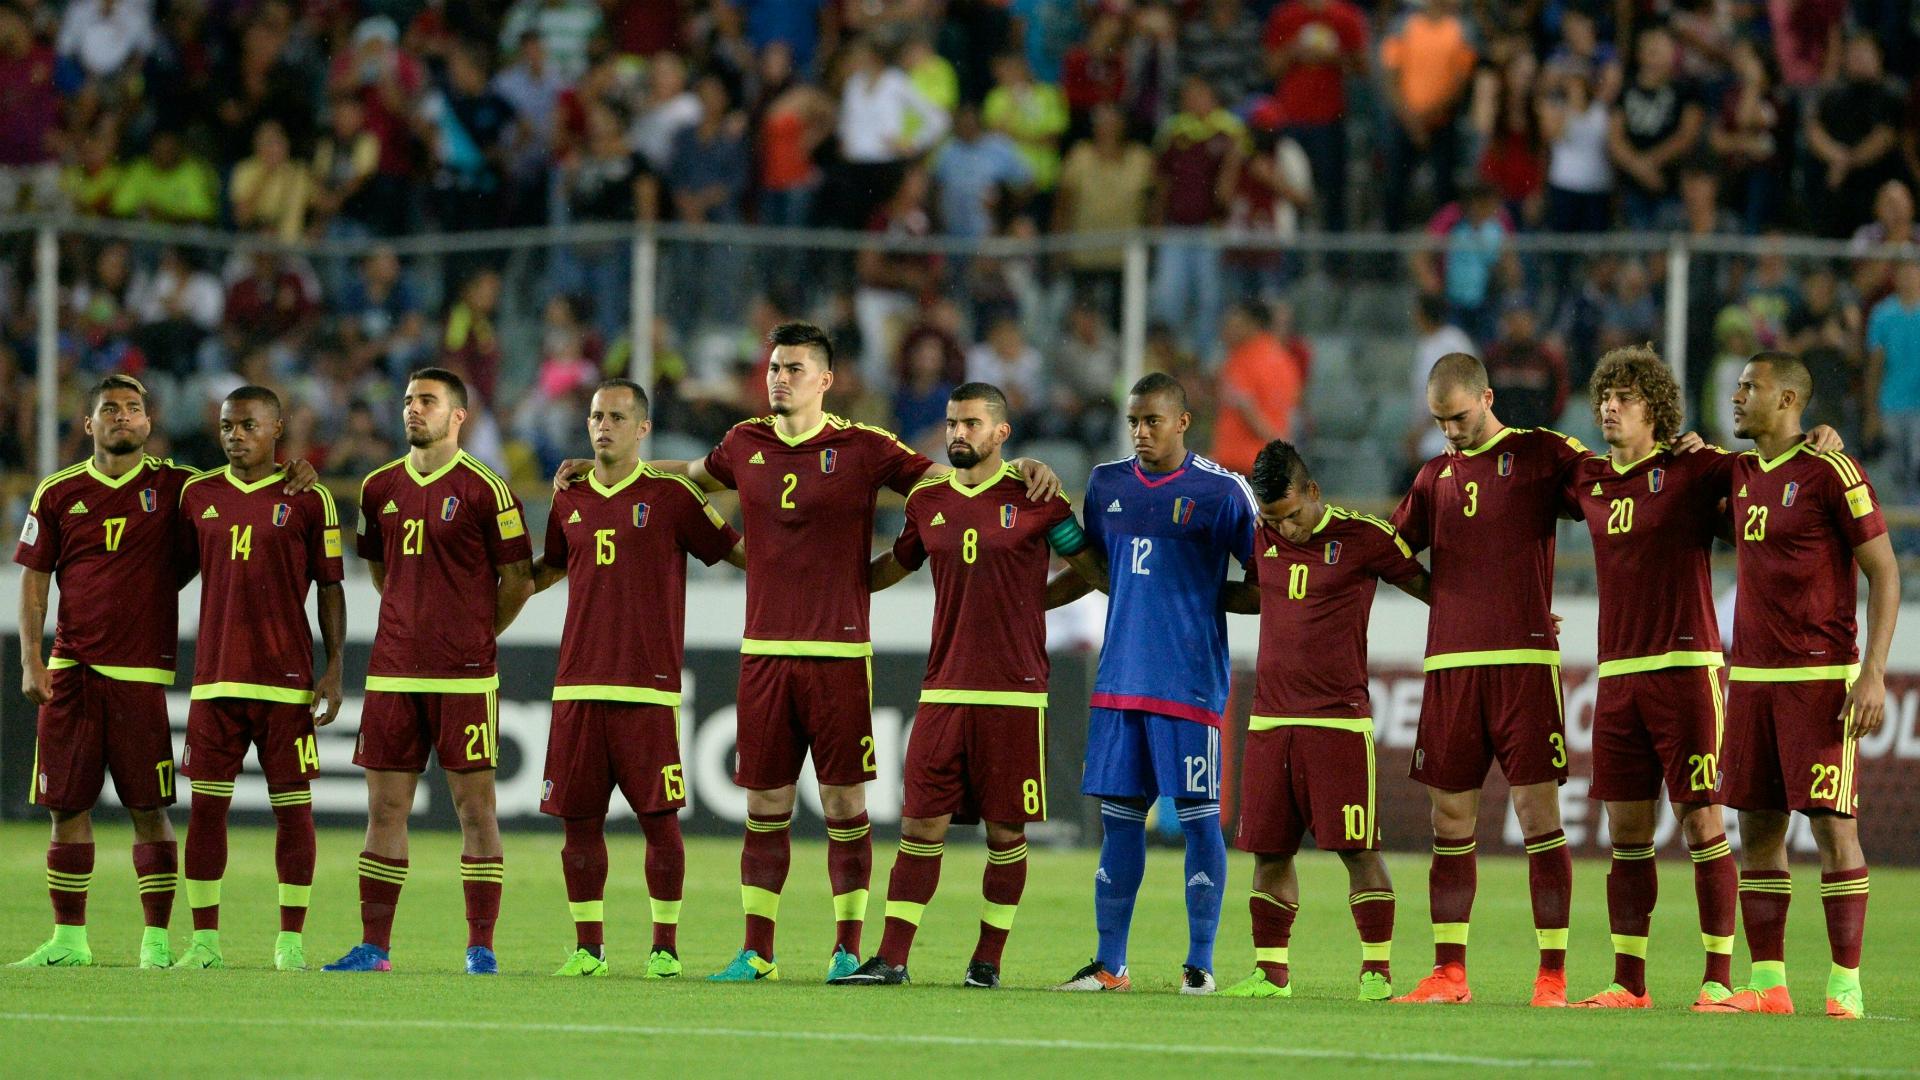 Venezuela Eliminatorias Sudamericanas 2018